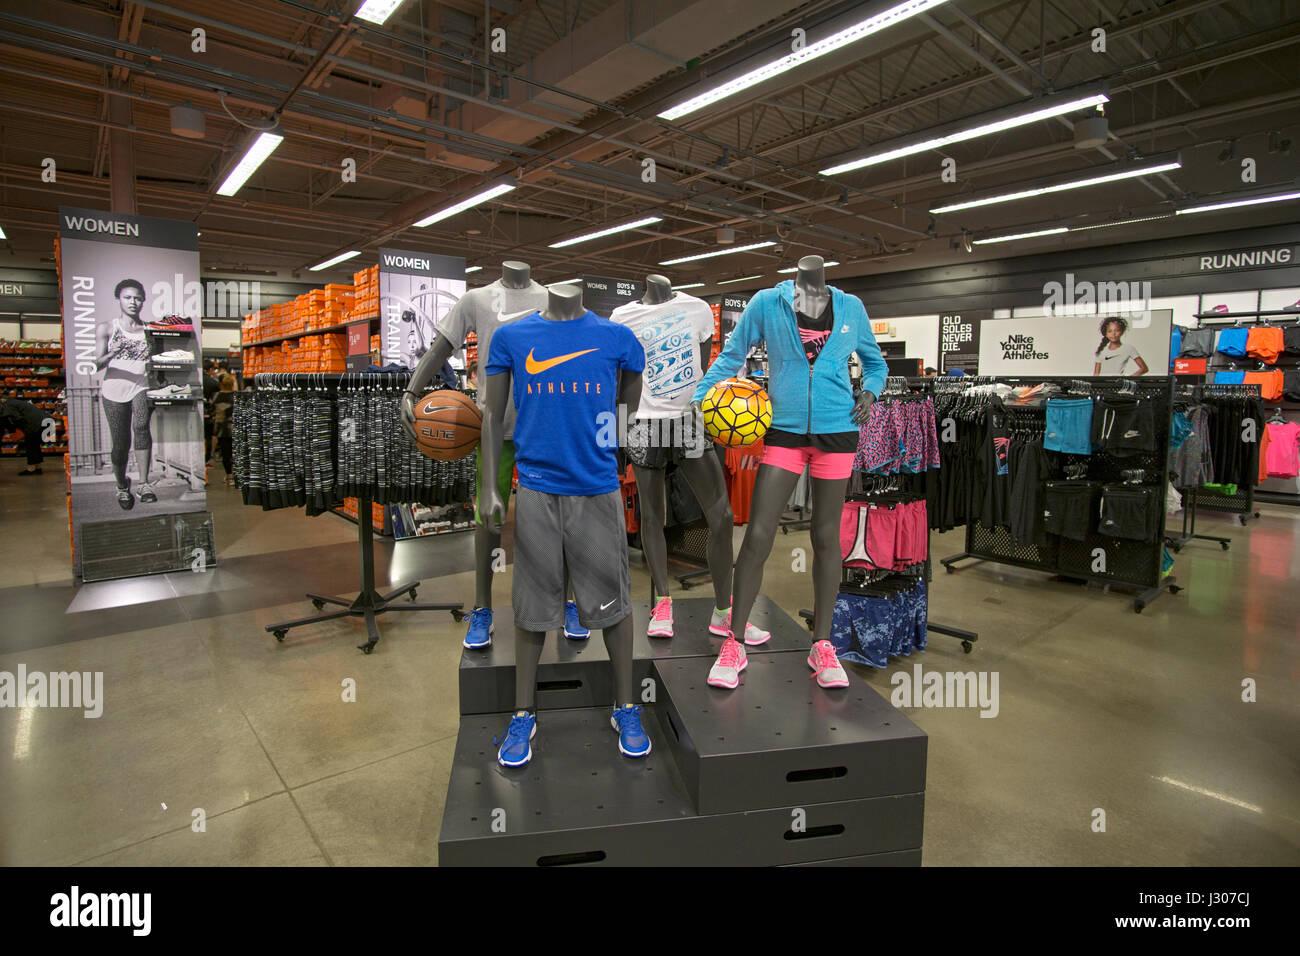 d542632c531d7 Nike articoli sportivi in vendita presso il Nike outlet store a Tanger  Outlets nel parco dei cervi